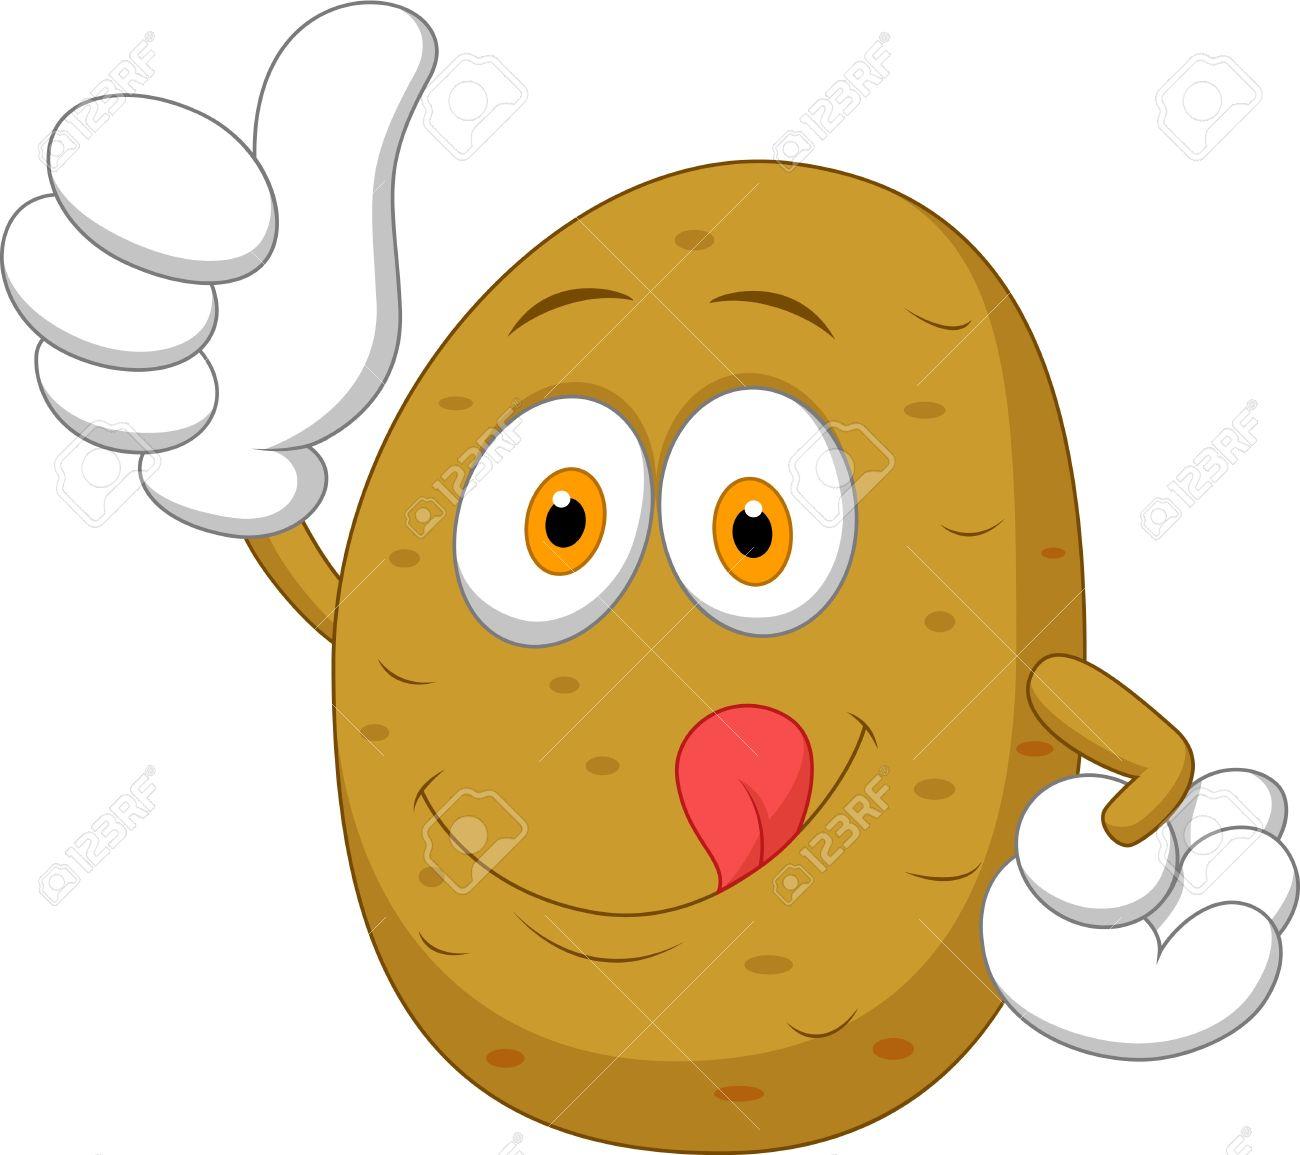 Potato clipart smile. Smiley x free clip